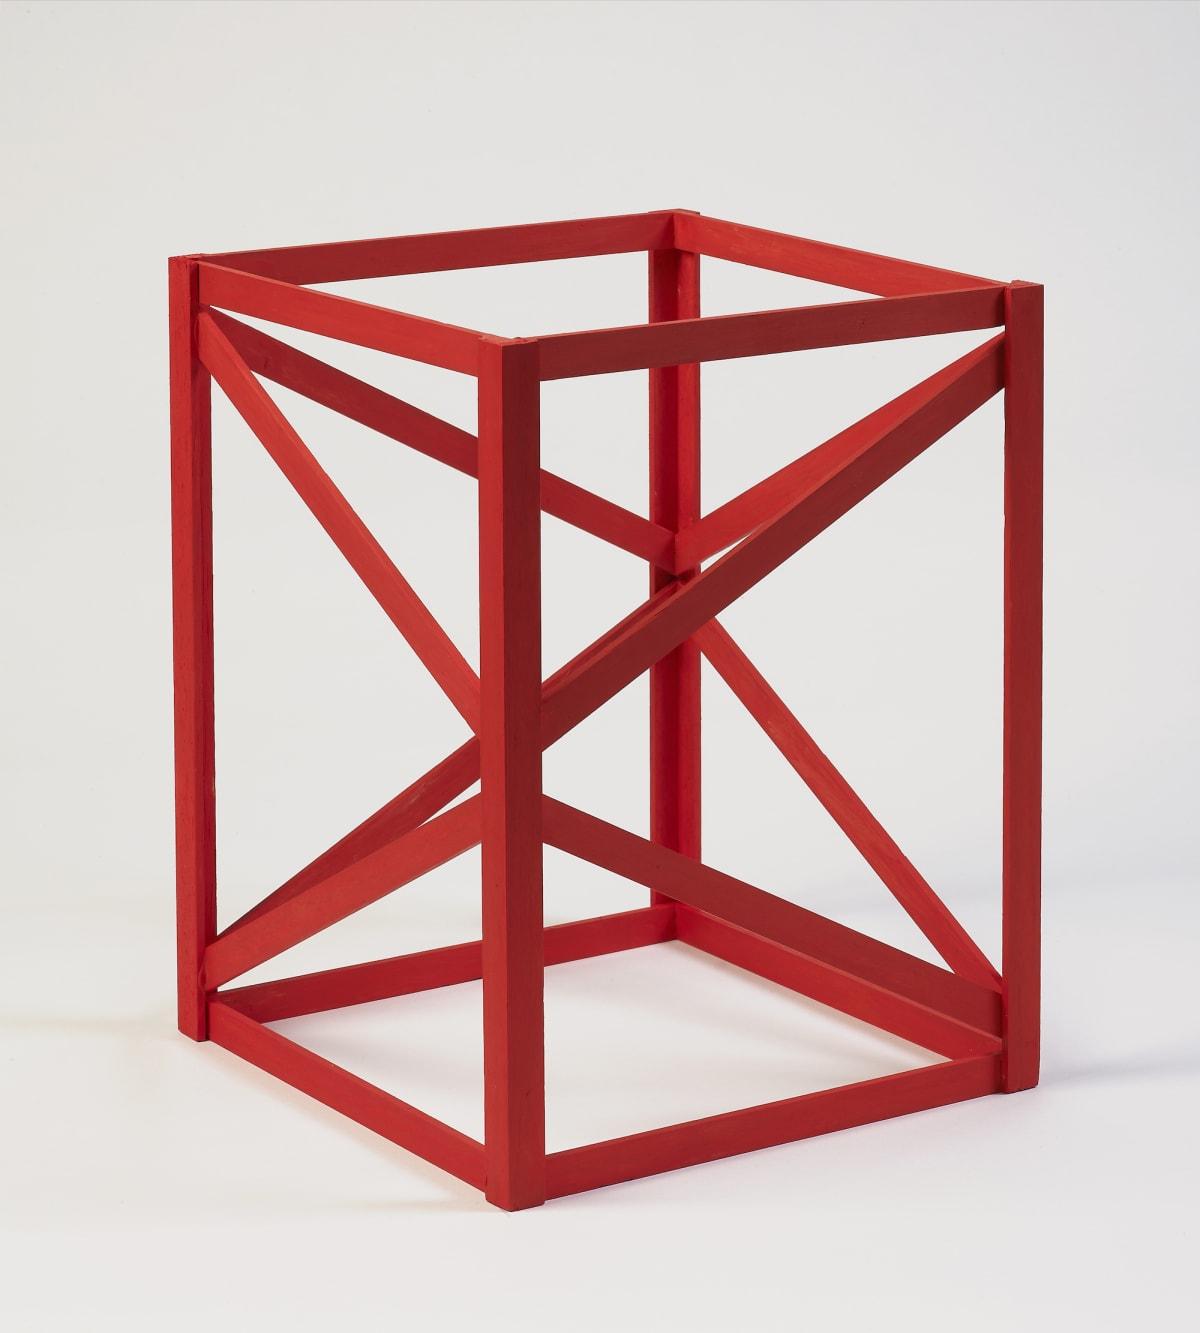 Rasheed Araeen Multi-Red, 1968-2018 Acrylic on wood 30 x 23 x 23 cm 11 3/4 x 9 1/8 x 9 1/8 in Edition of 50